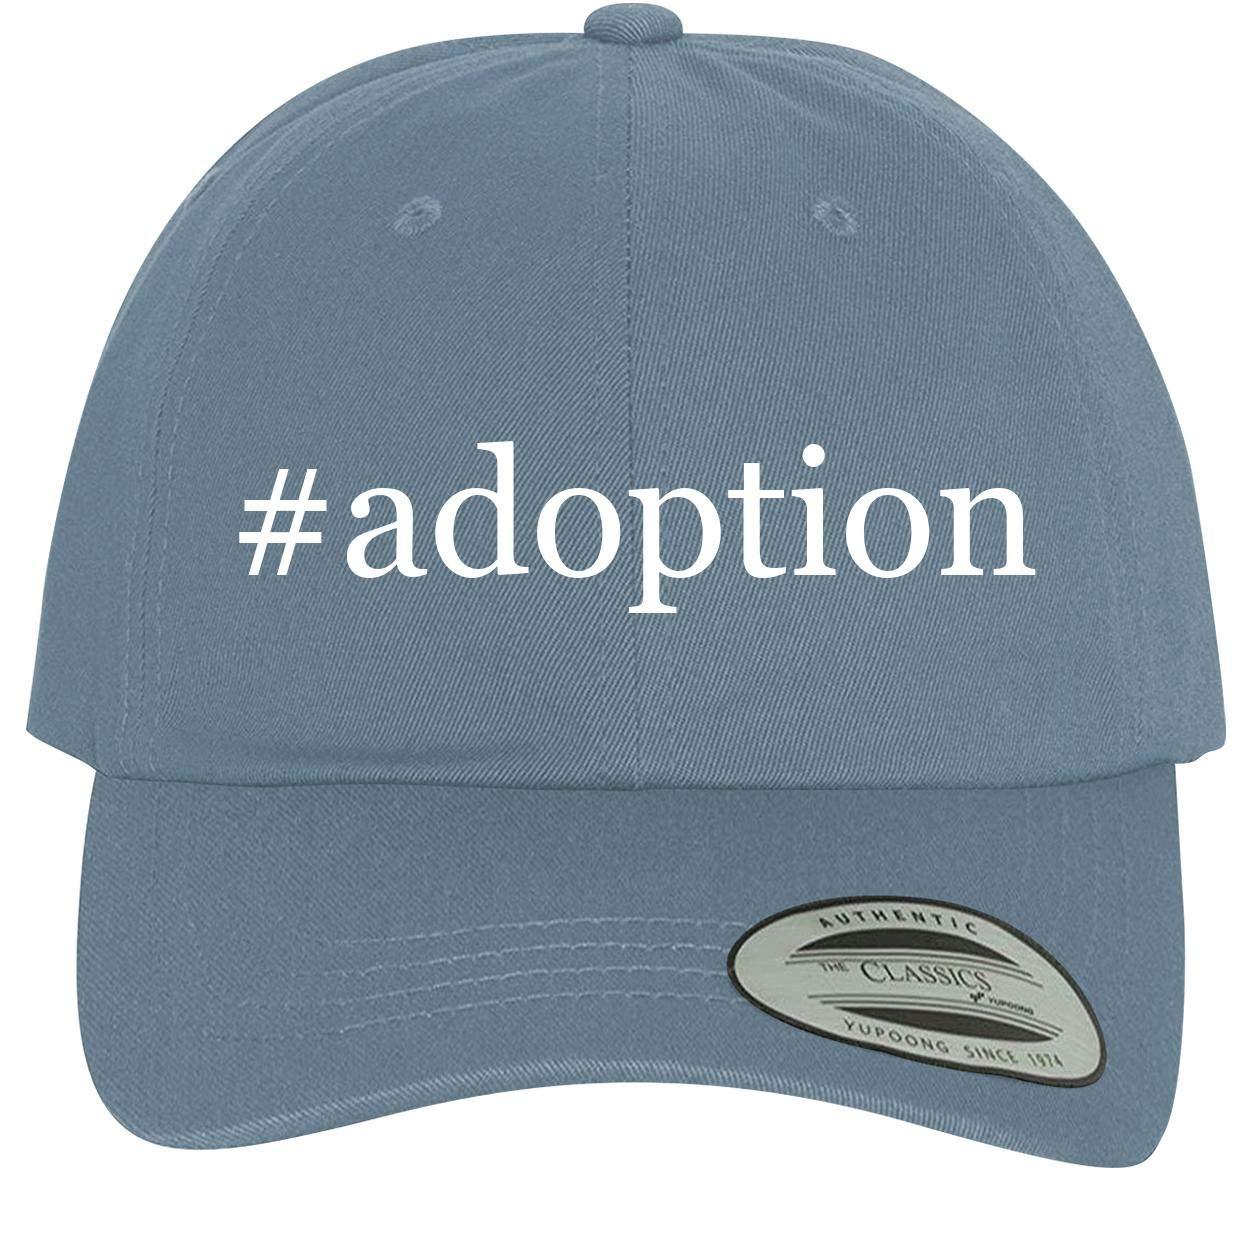 Comfortable Dad Hat Baseball Cap BH Cool Designs #Adoption